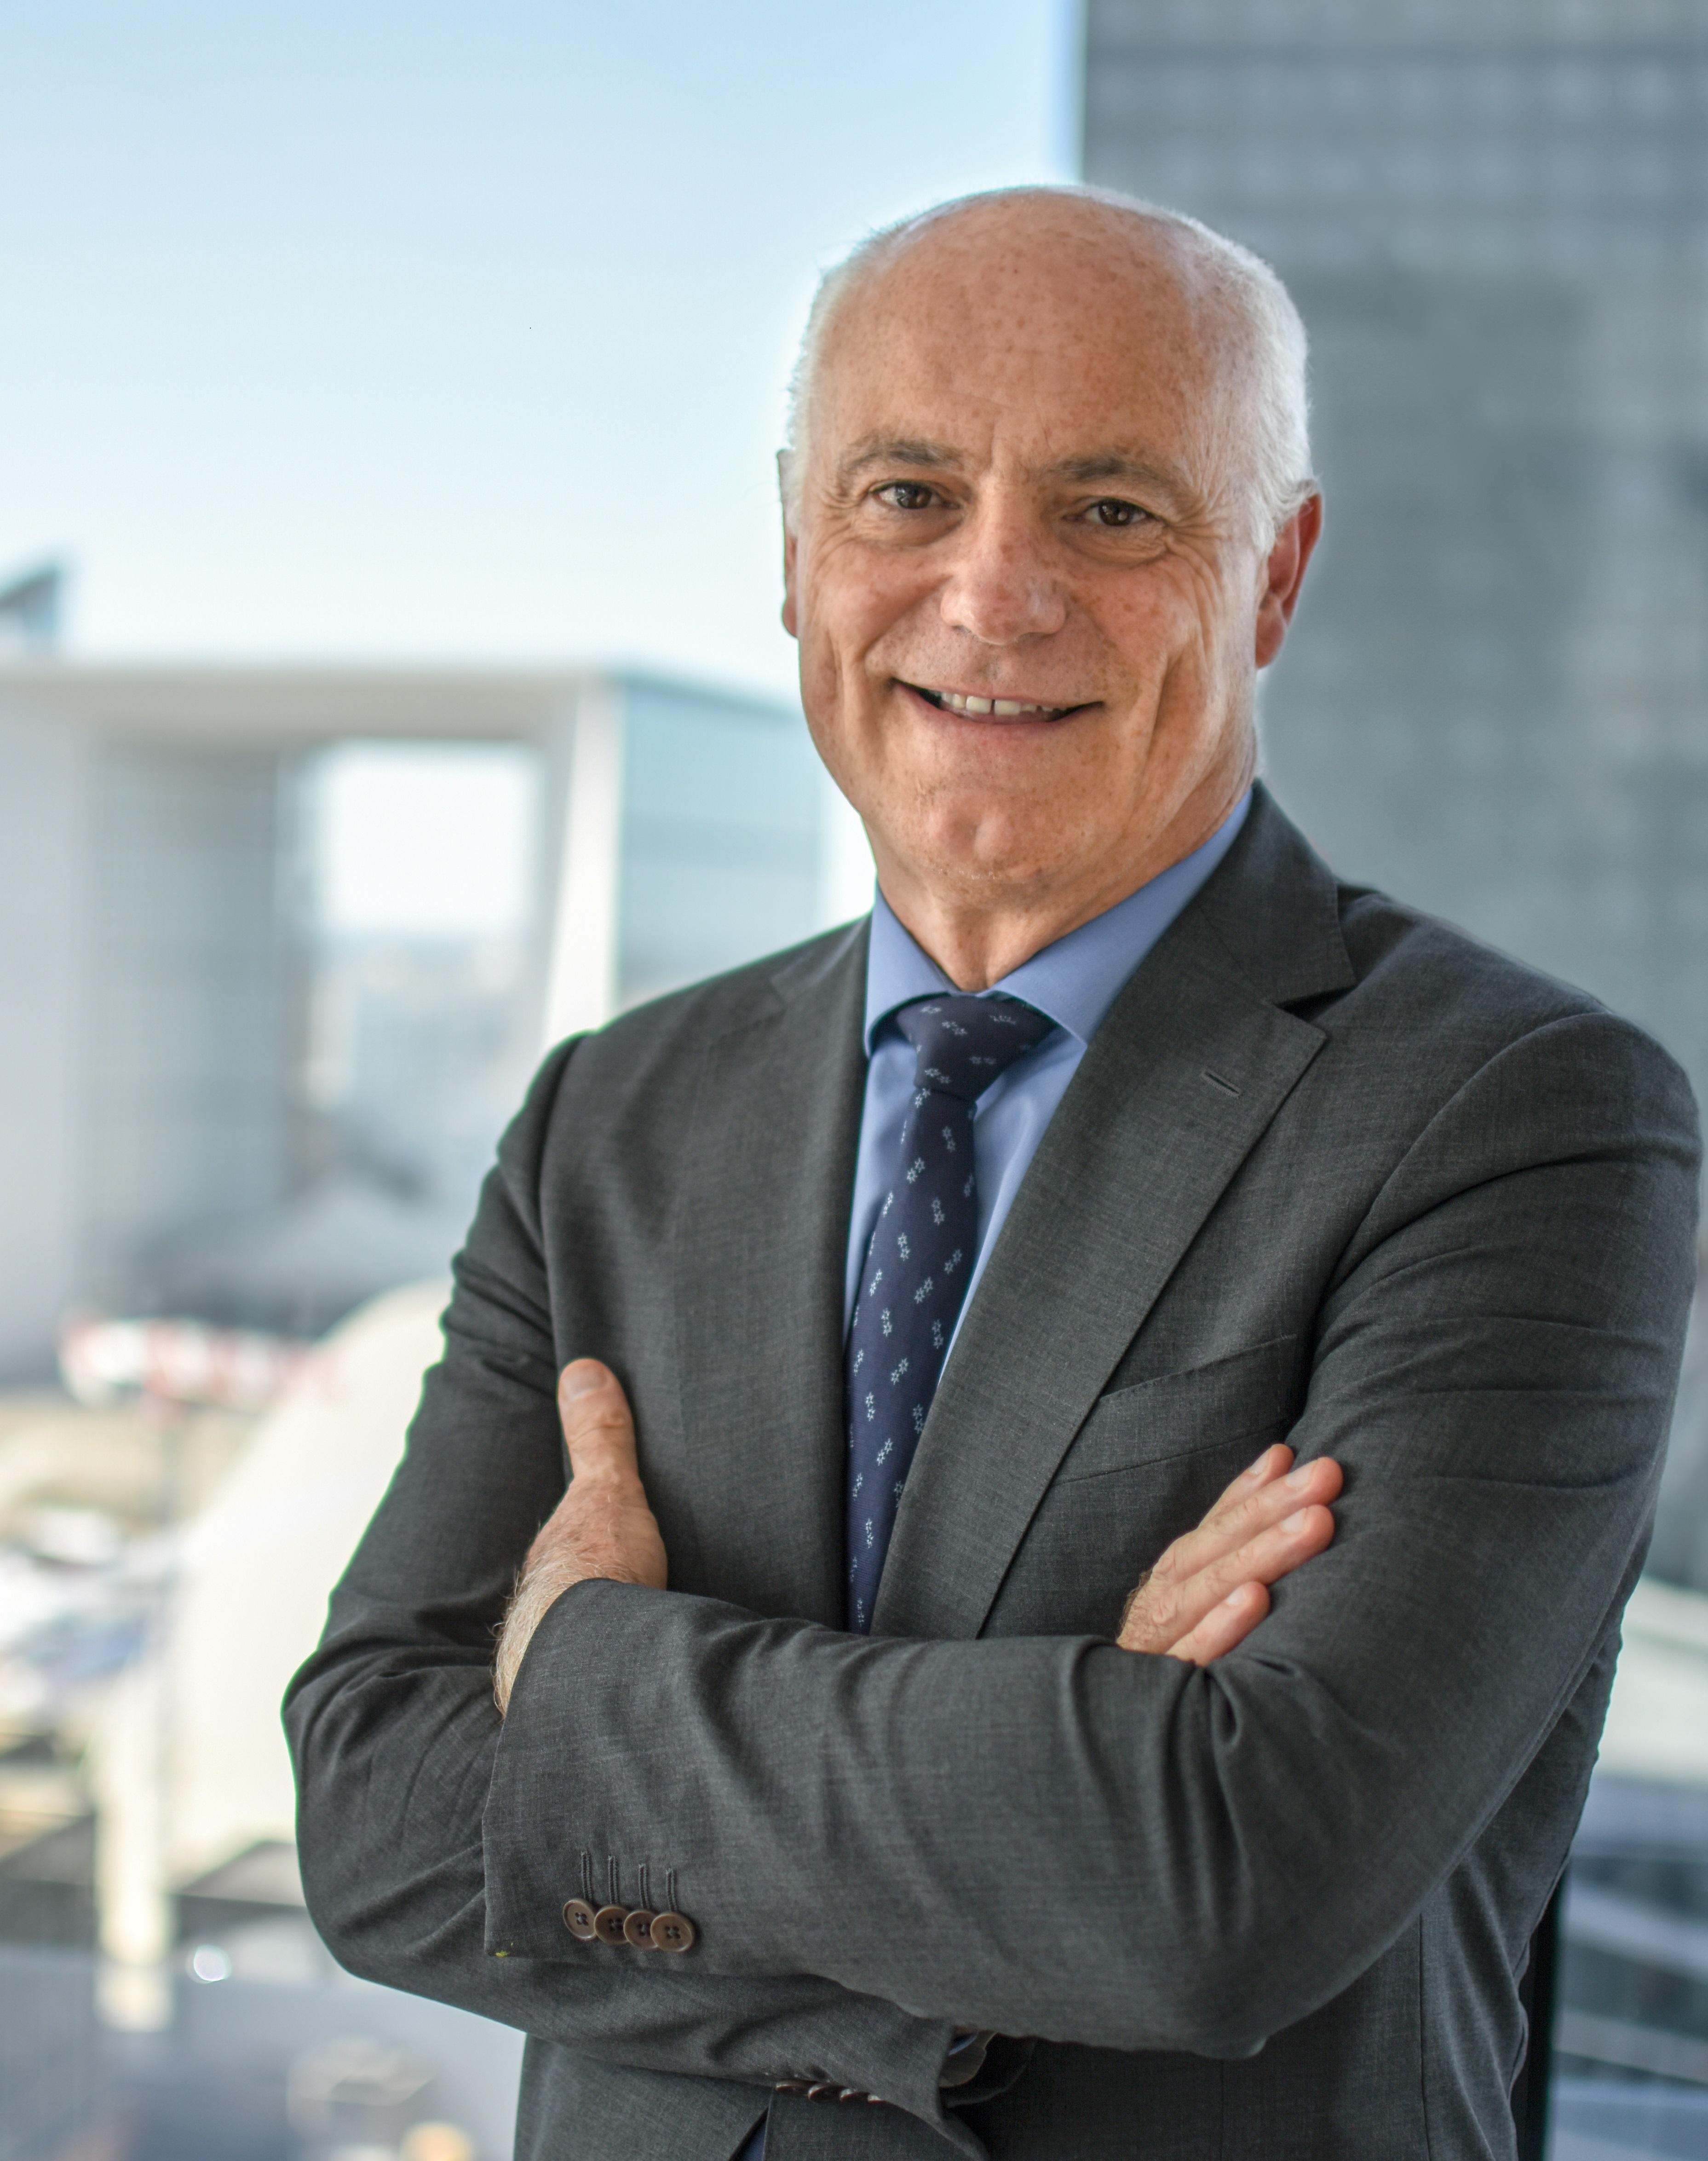 JOSÉ MANUEL CAMPA - Supervision, Risks & Profitability